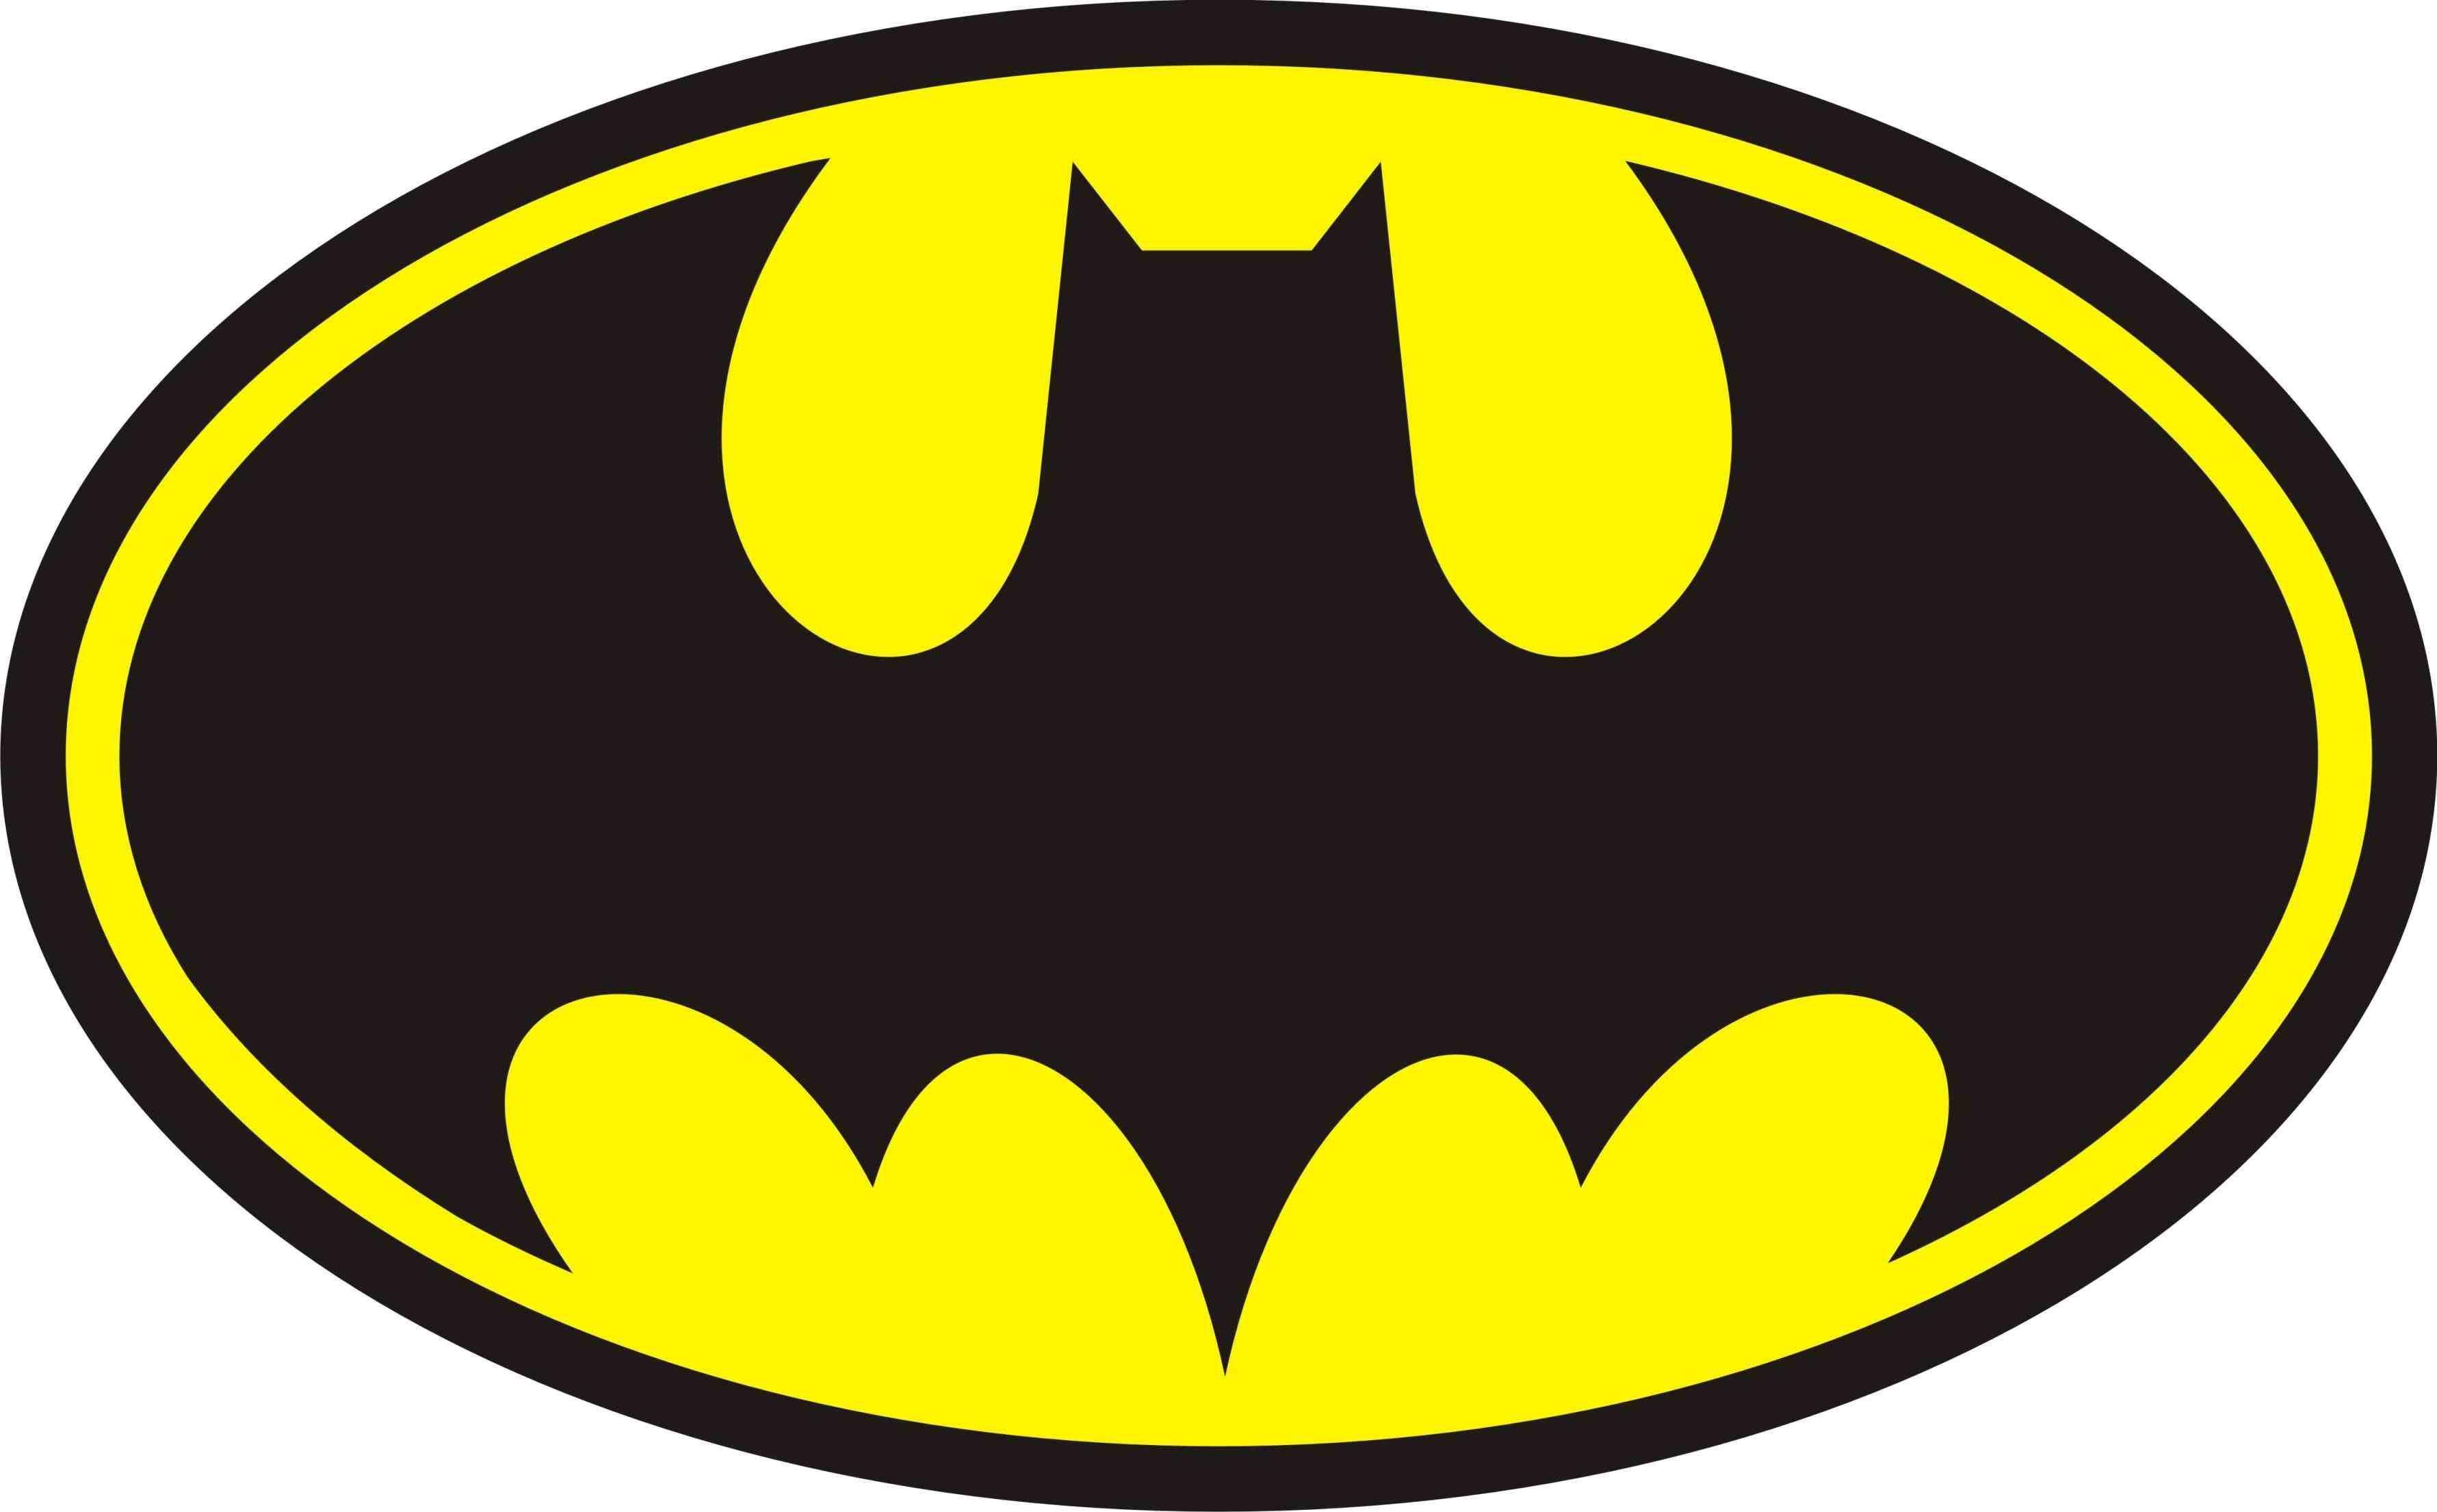 Lego batman clipart Printable batman logo